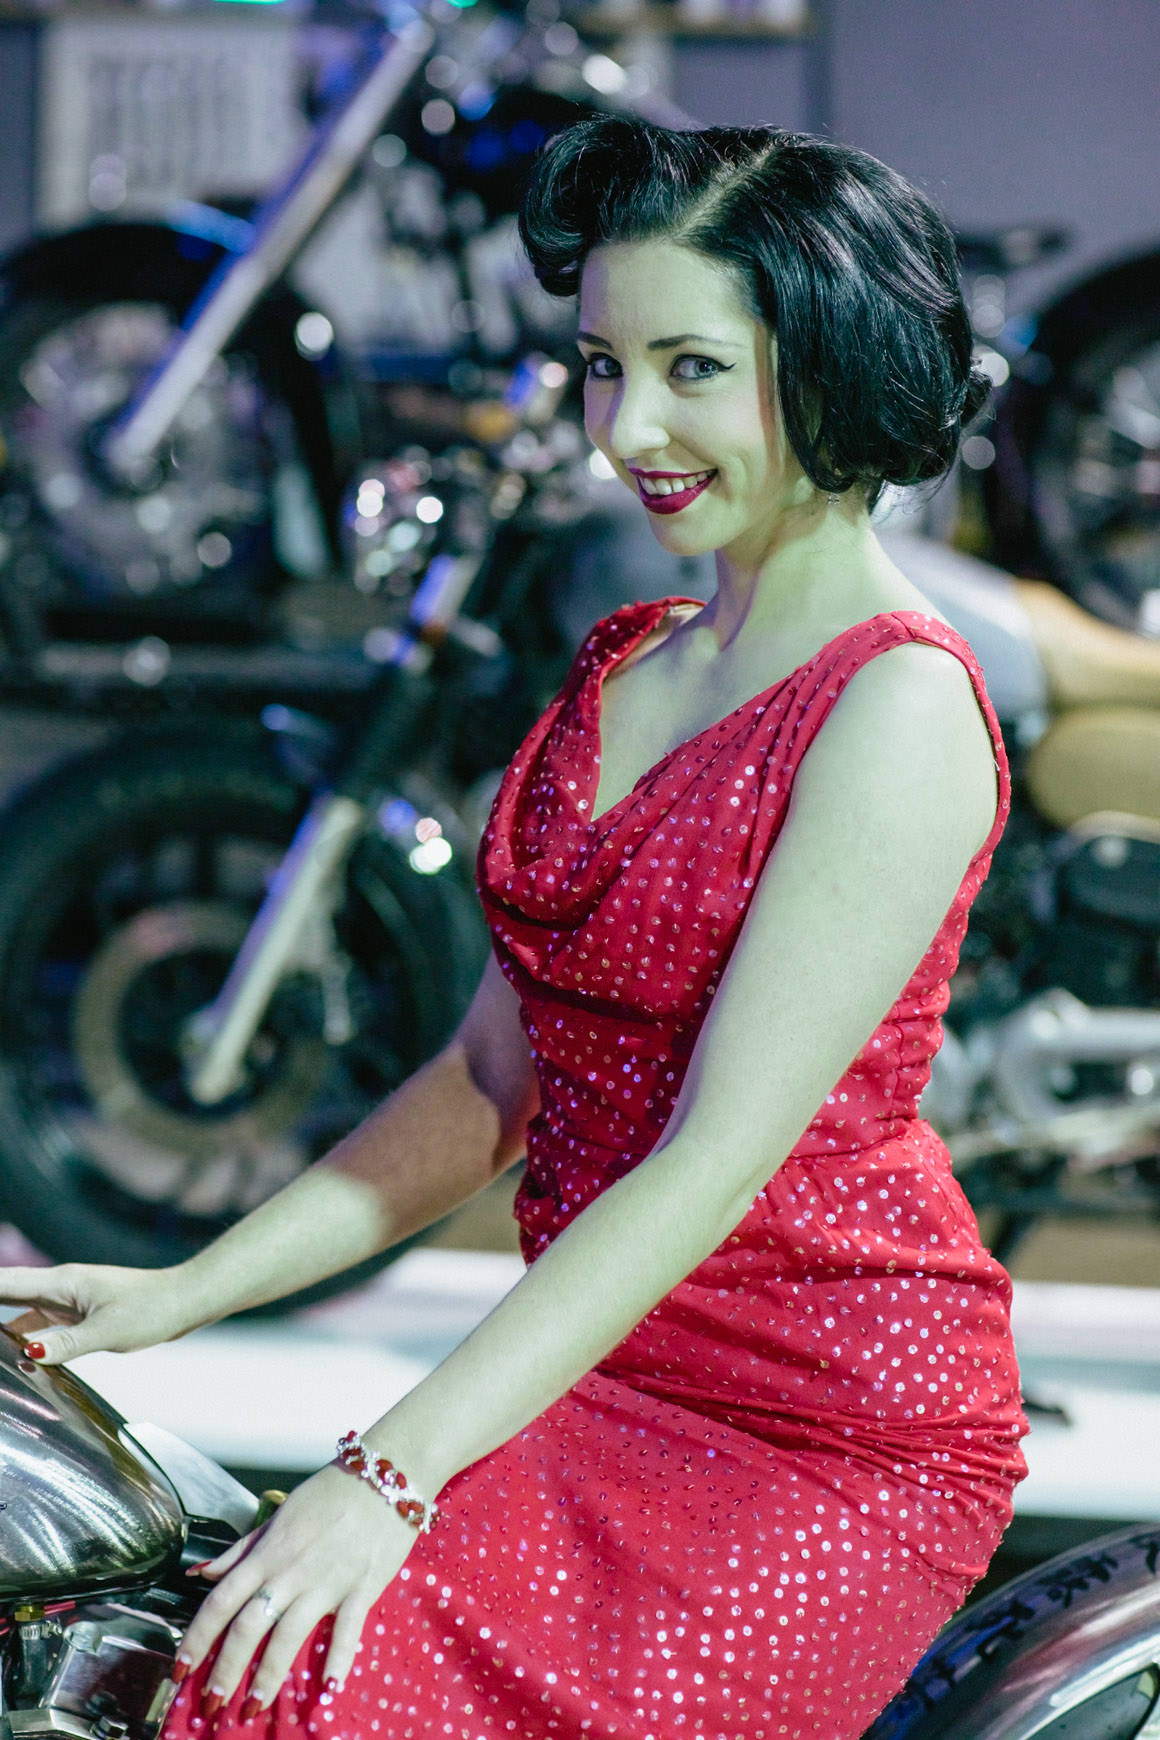 gasolina-vintage-bikes-girl